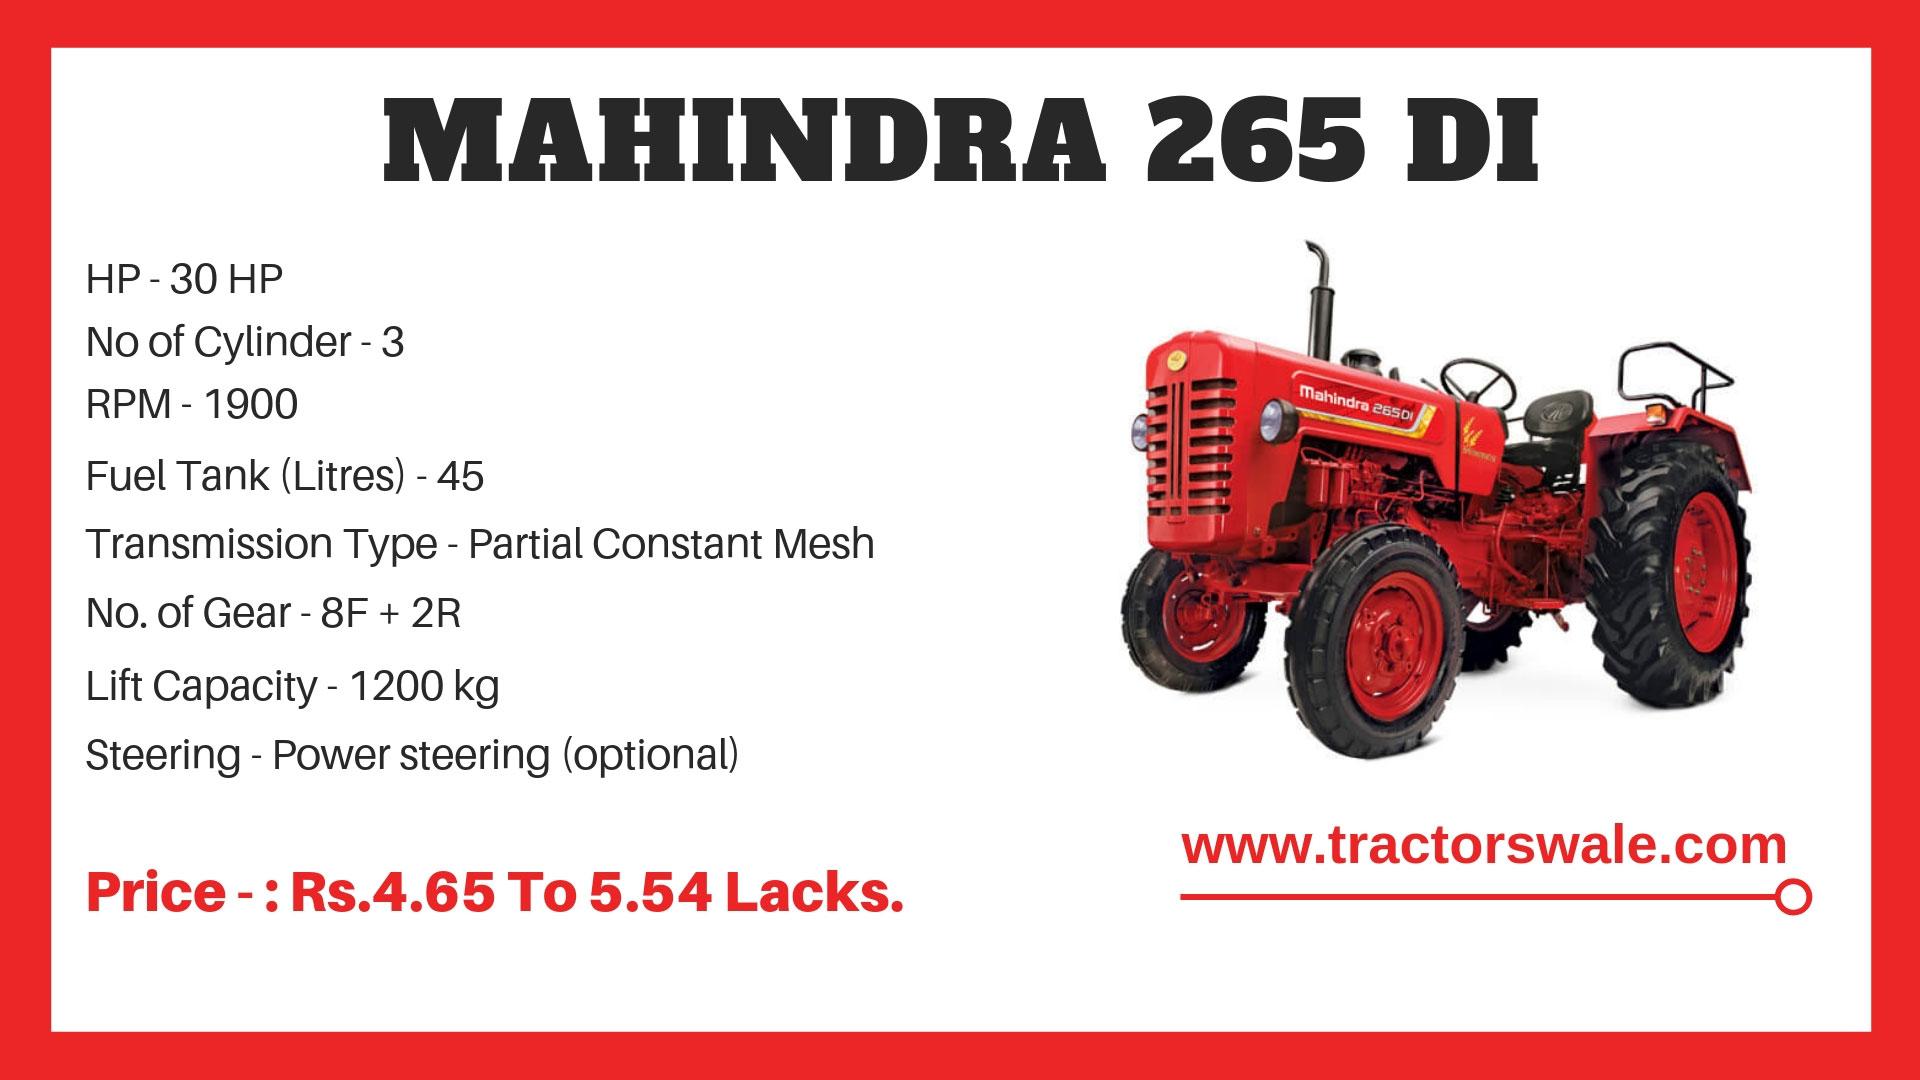 mahindra-265-di-specifications